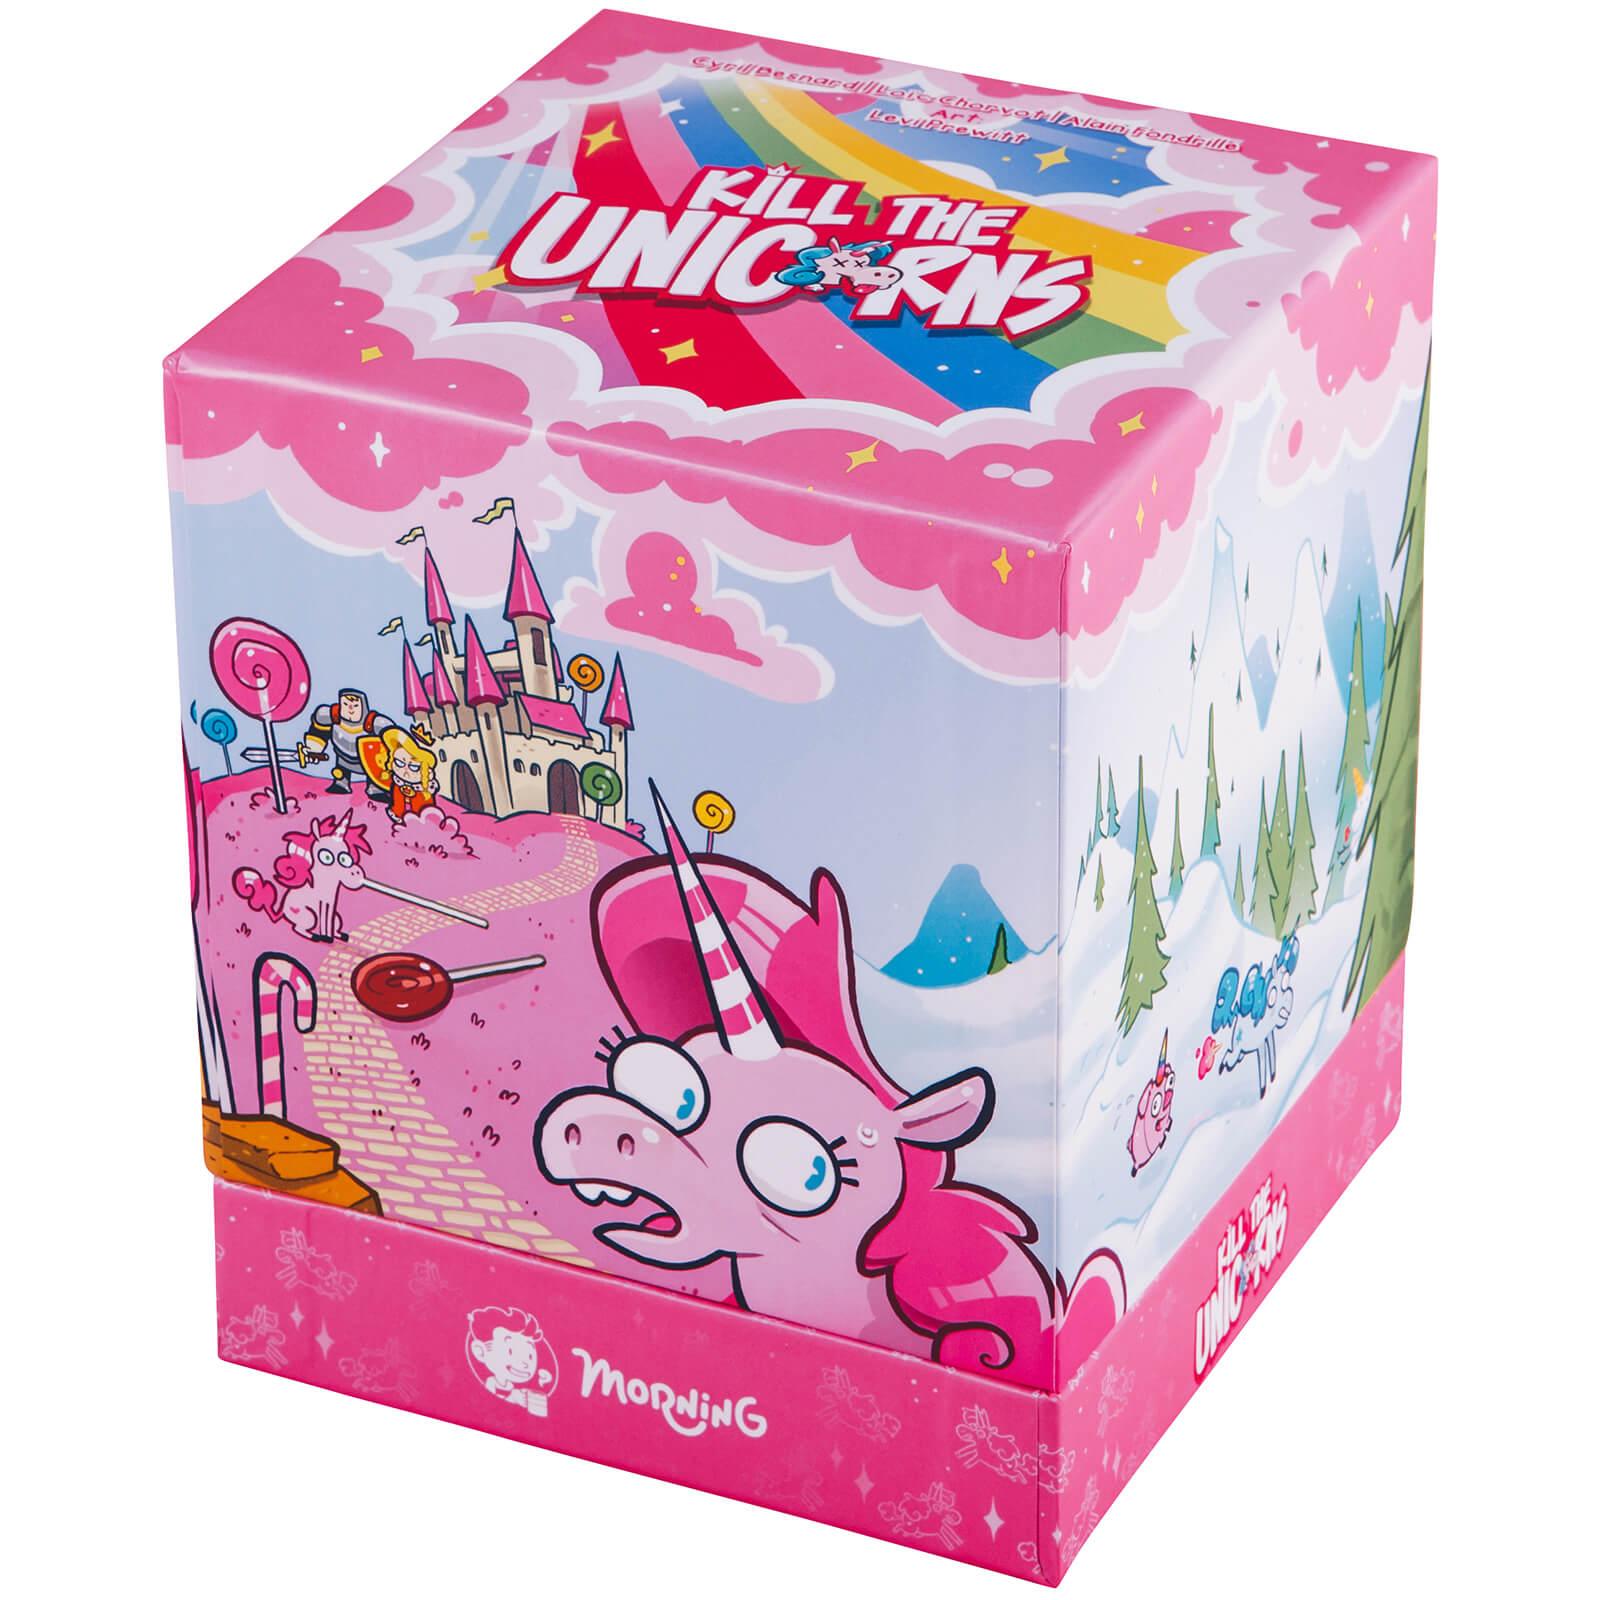 Image of Kill the Unicorns Card Game